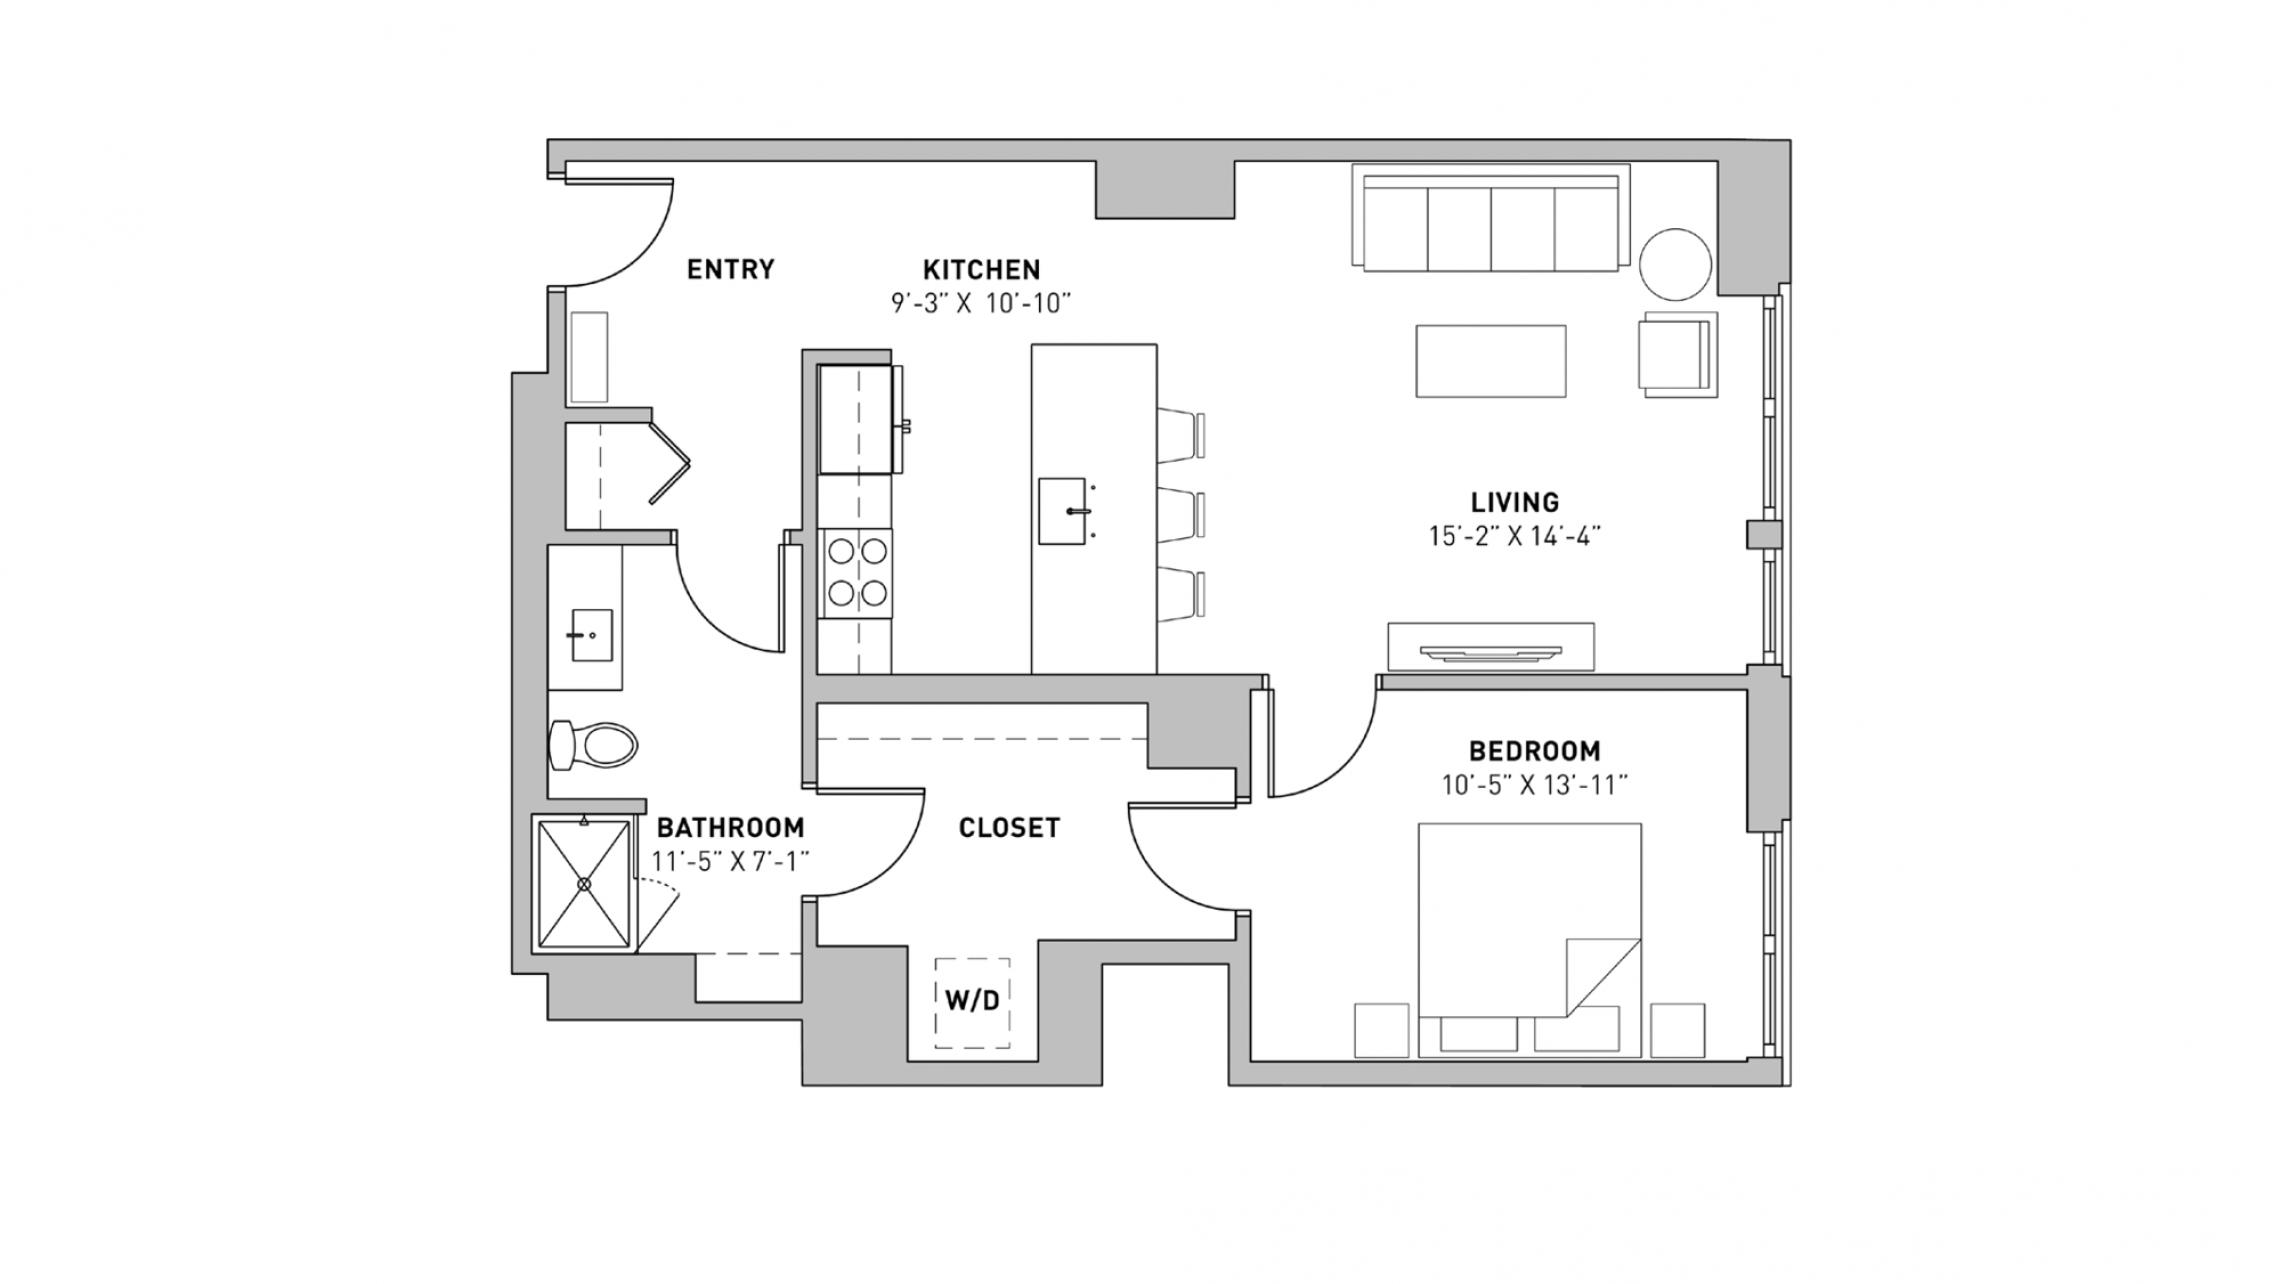 ULI The Pressman 911 - One Bedroom, One Bathroom